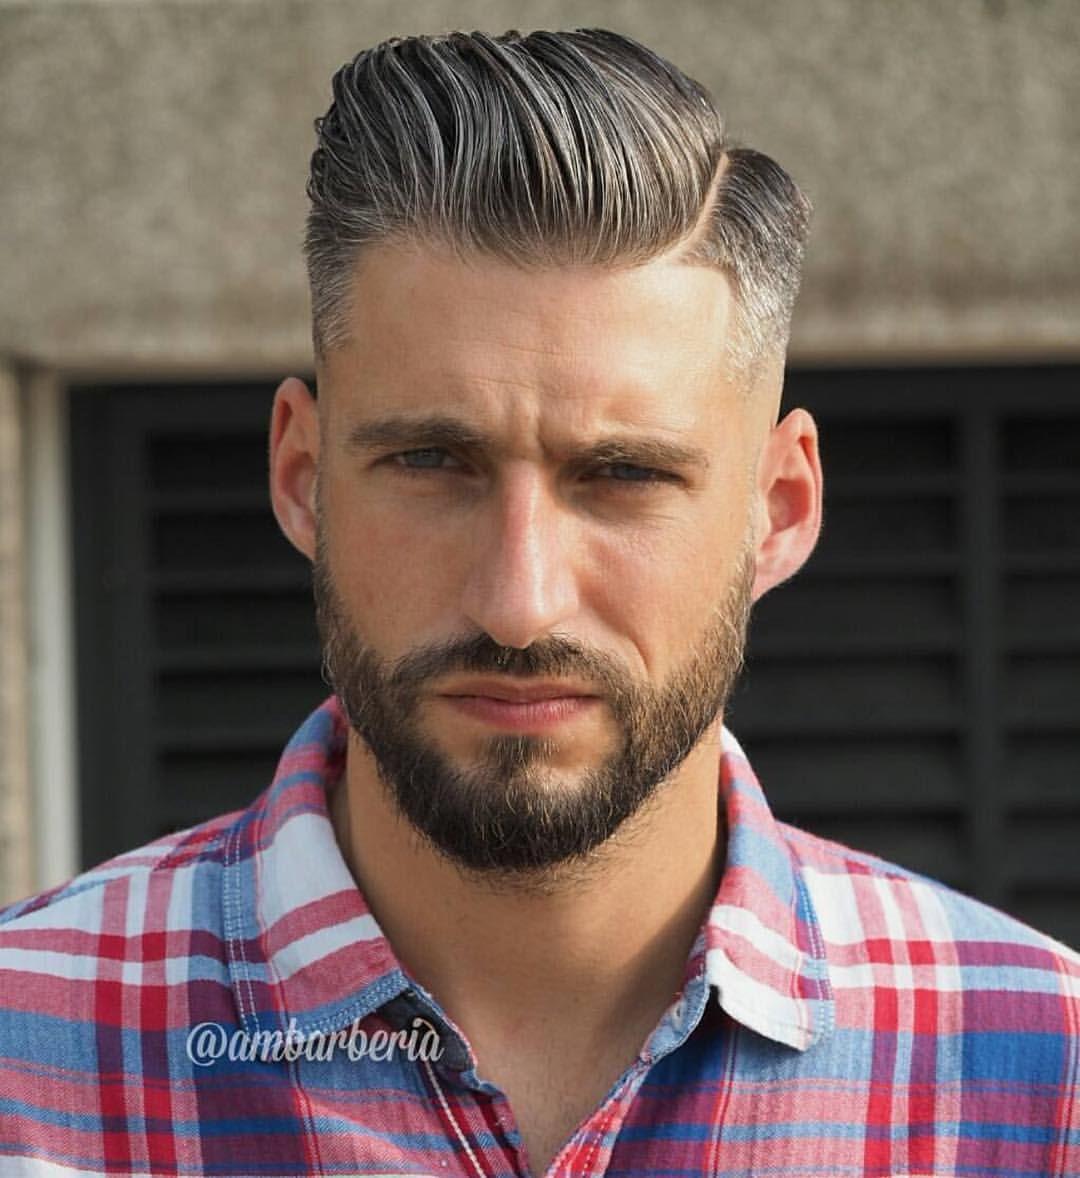 Official haircut for boys  me gusta  comentarios  hairmenstyle official